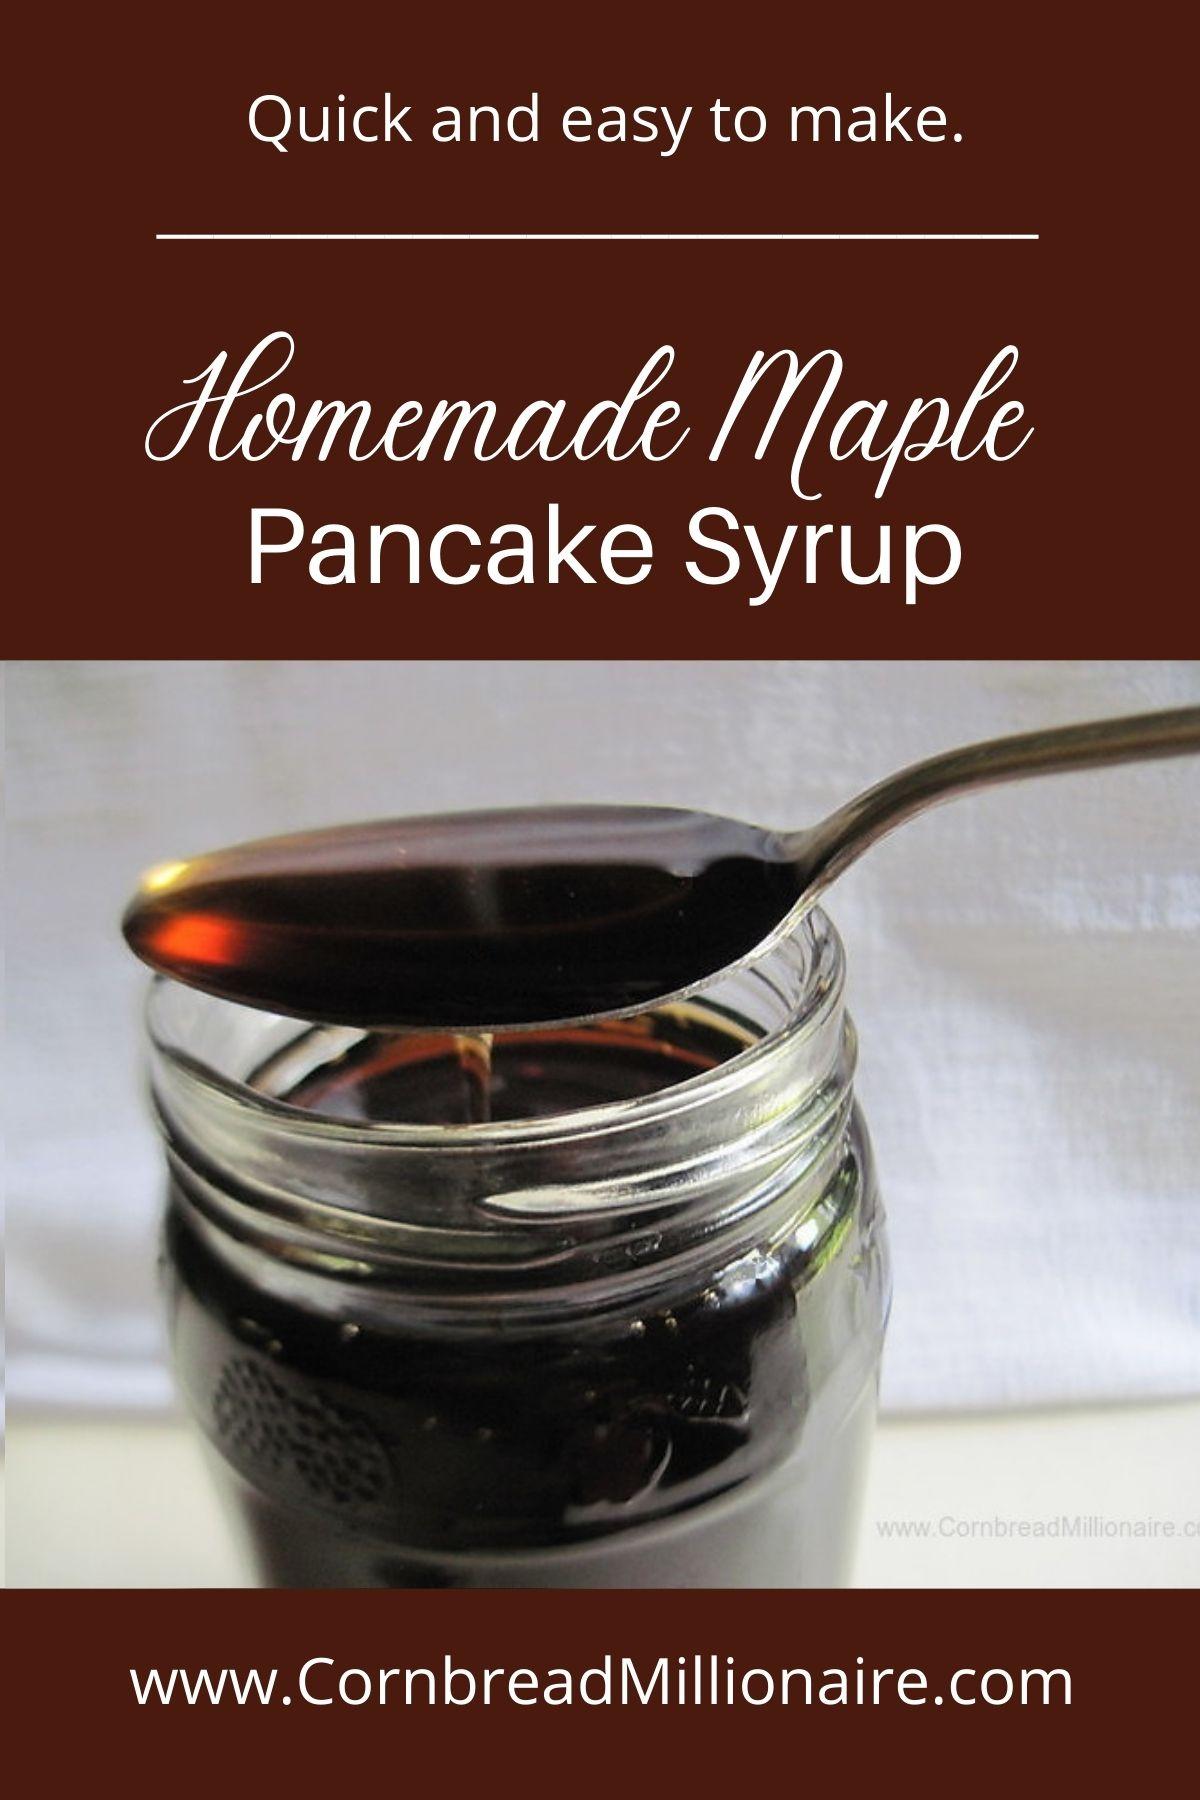 Homemade Maple Pancake Syrup